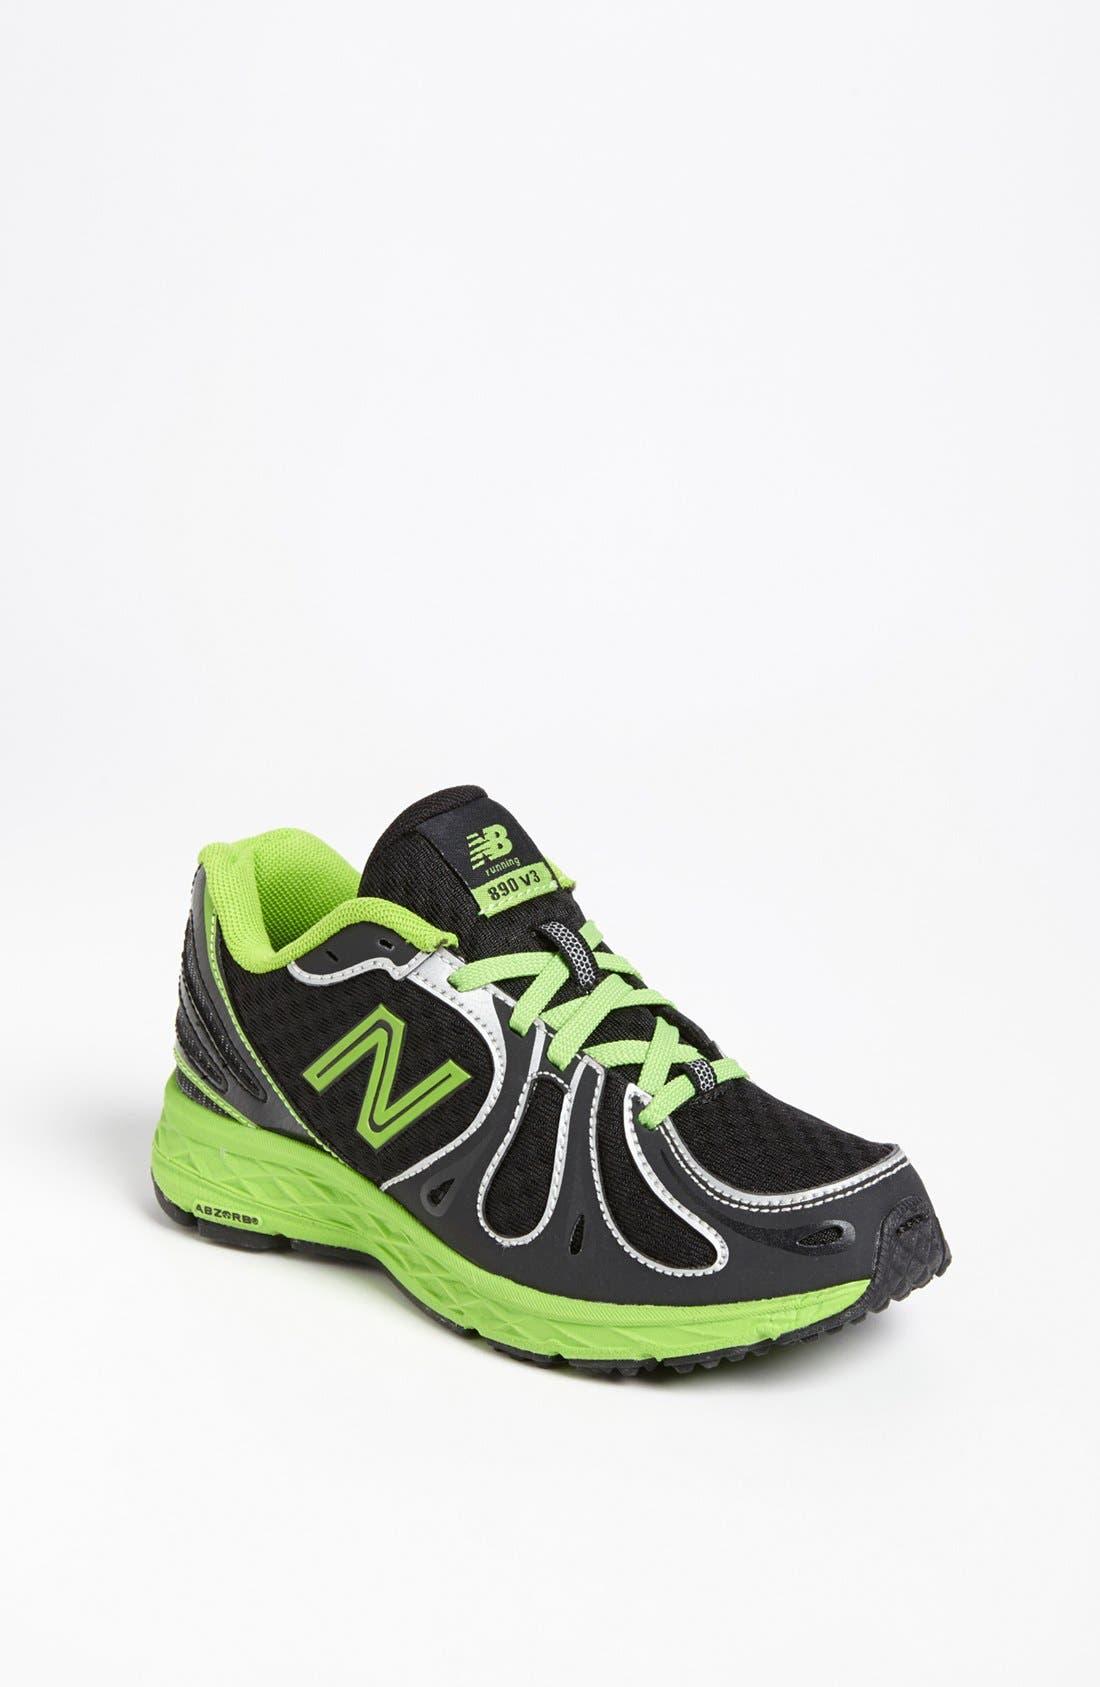 Main Image - New Balance '890' Sneaker (Toddler & Little Kid) (Online Only)